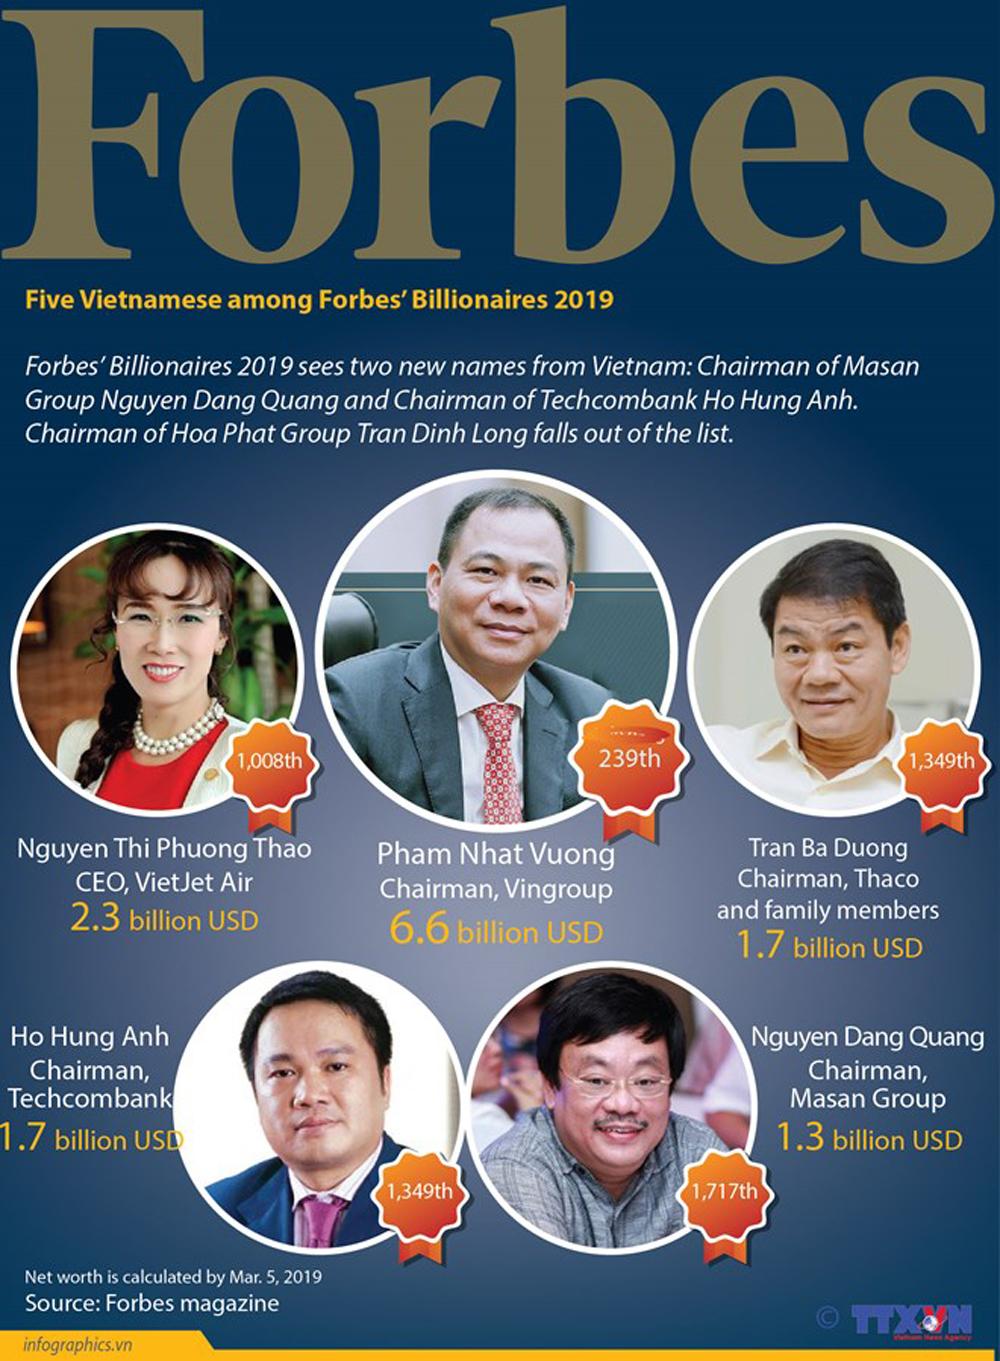 Five Vietnamese, Forbes' Billionaires 2019, richest person, Forbes magazine